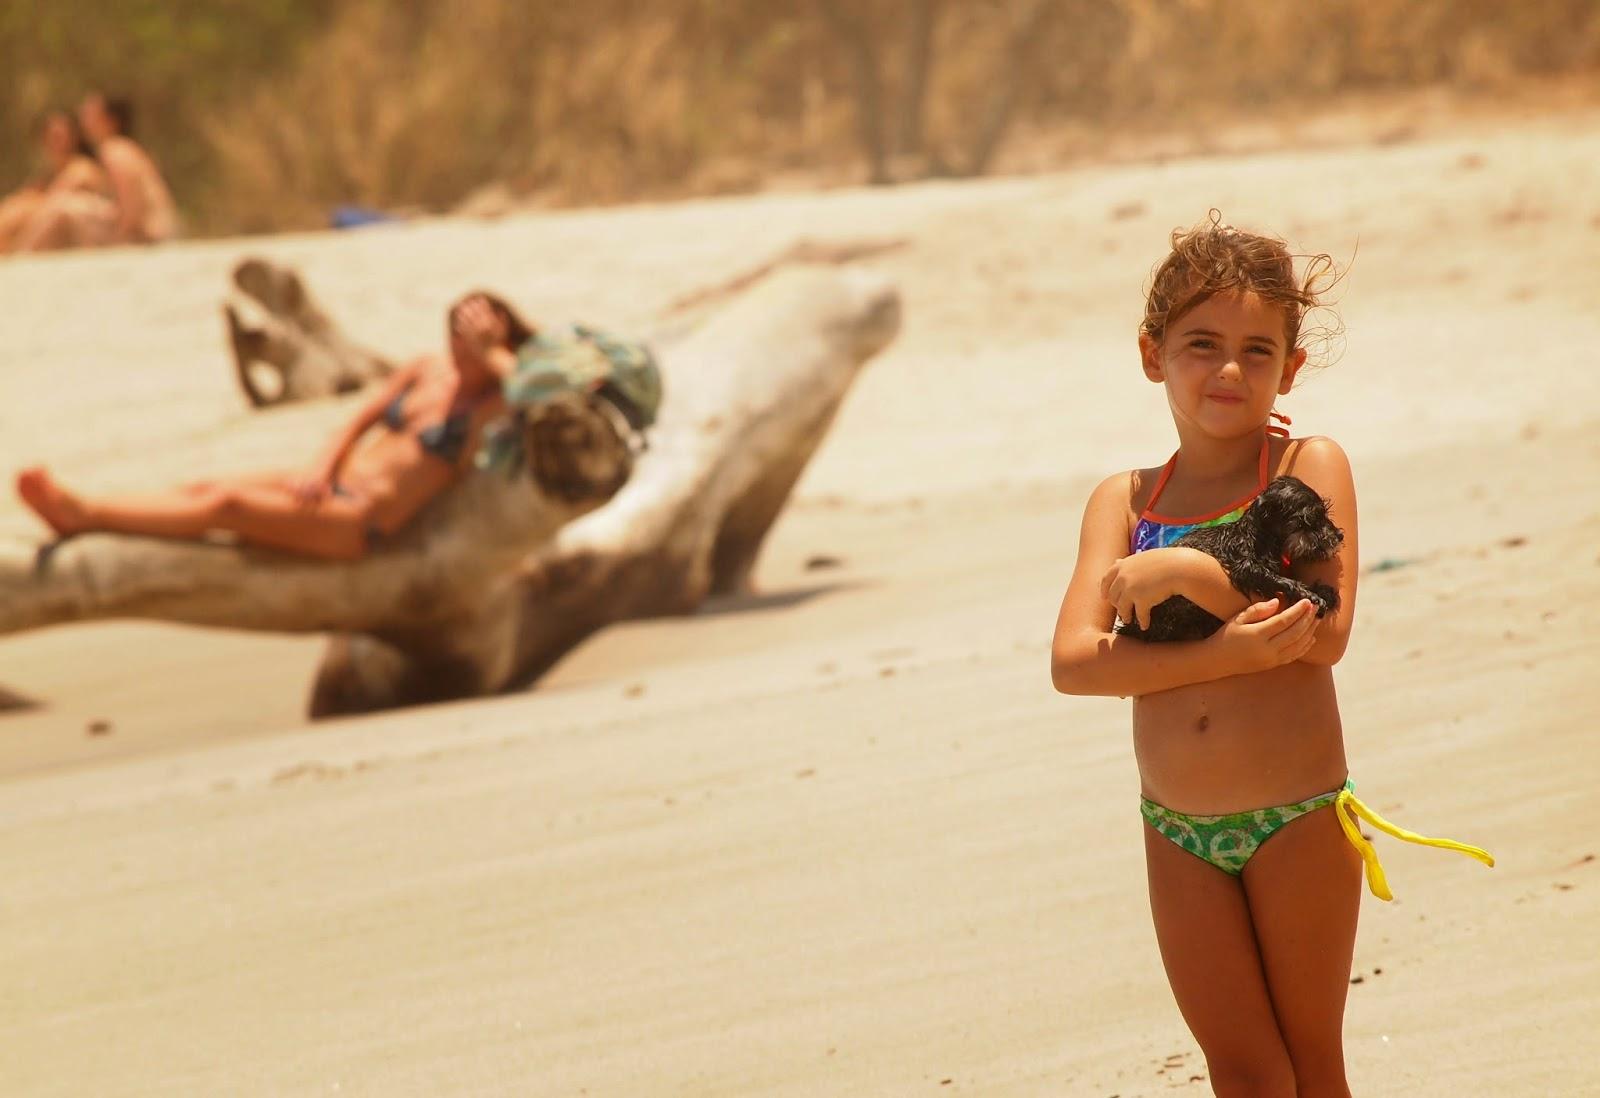 Torneo de Surf - Foto Susana Mora